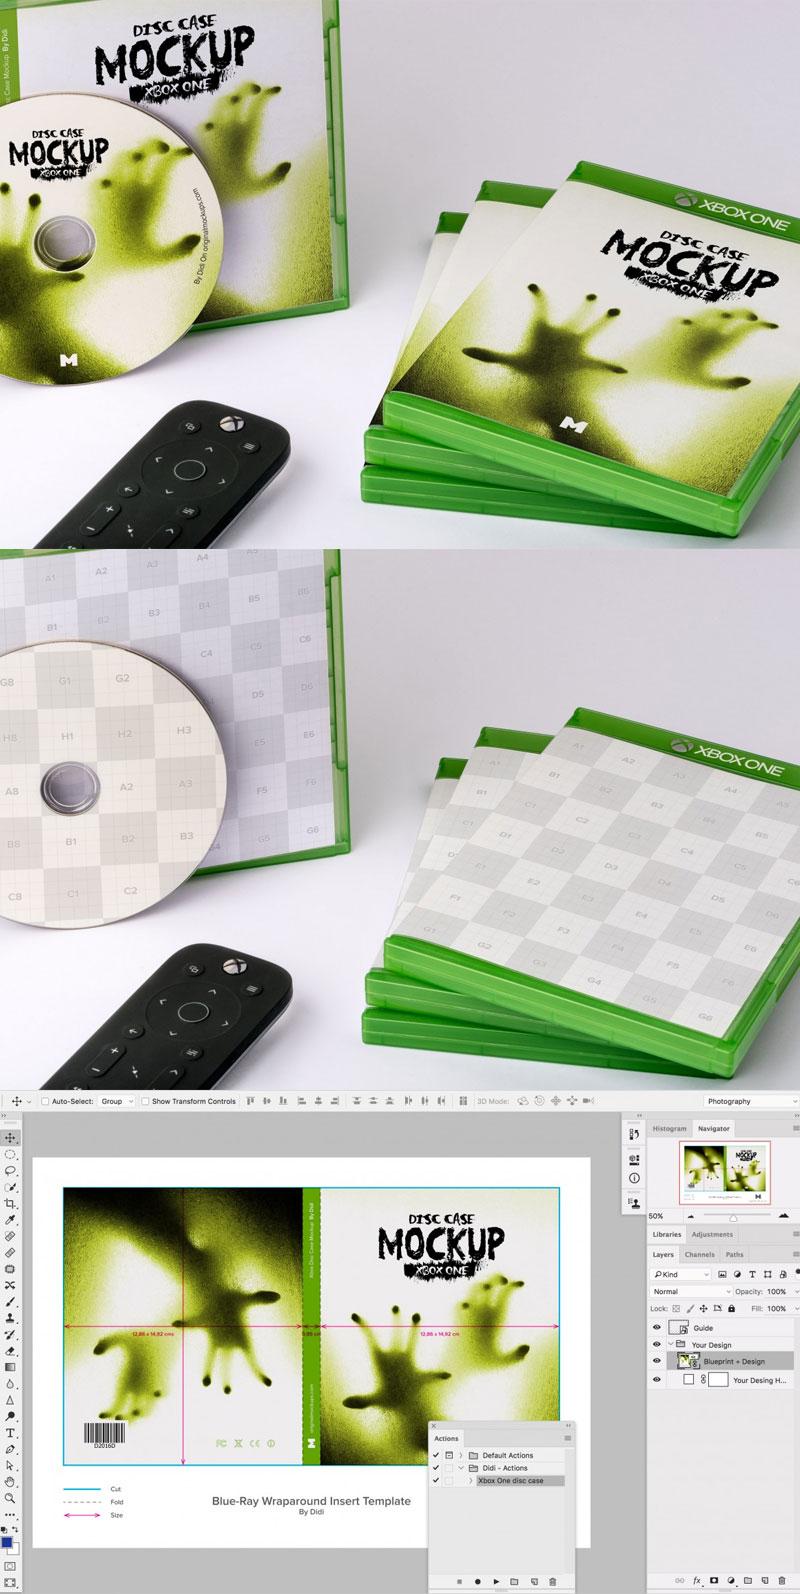 Xbox-One-Disc-Case-Mockup